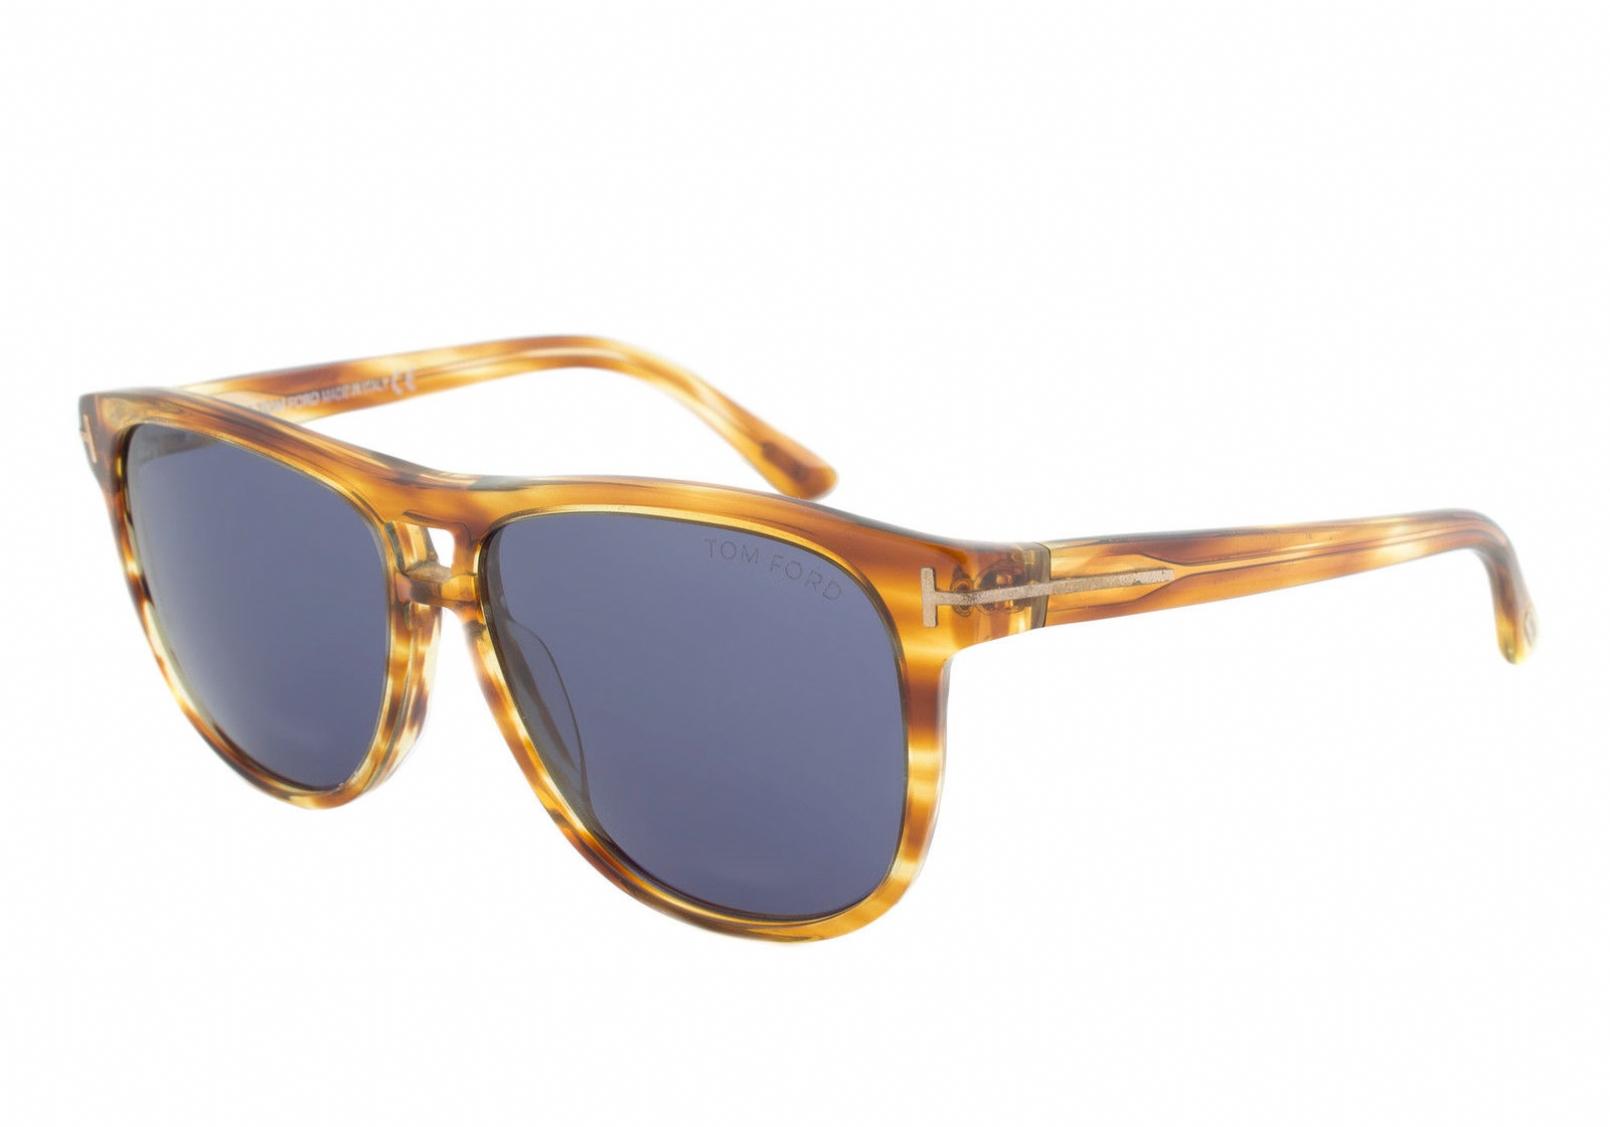 d63b5481b2c4 Tom Ford Lennon Tf288 Sunglasses